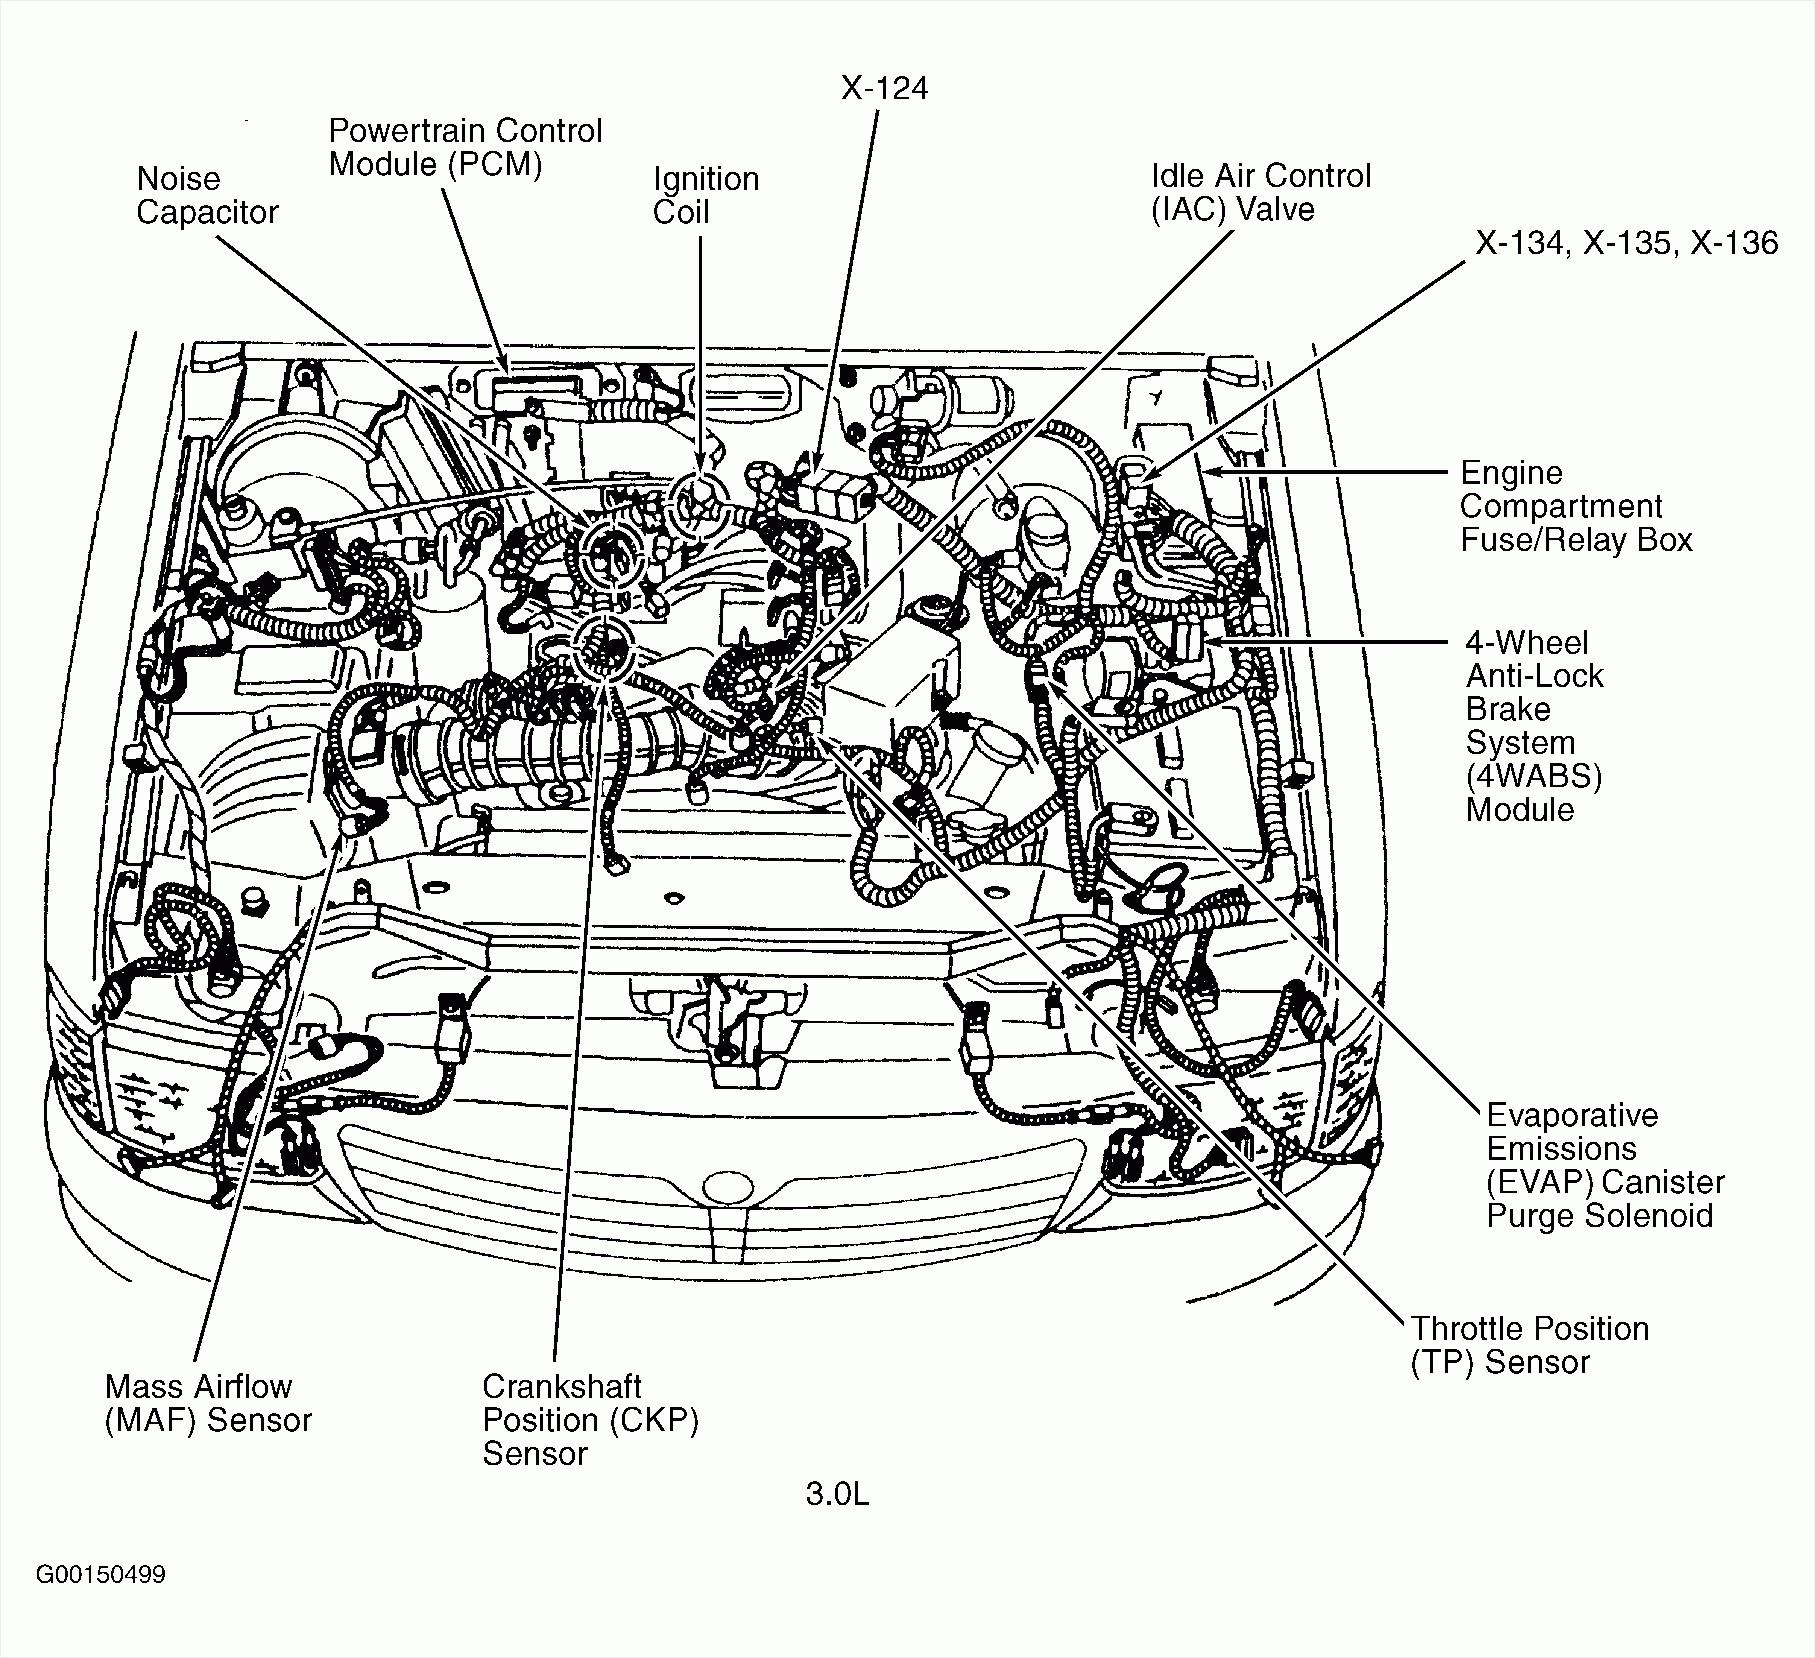 mazda rx8 engine diagram 5 9 spikeballclubkoeln de \u2022